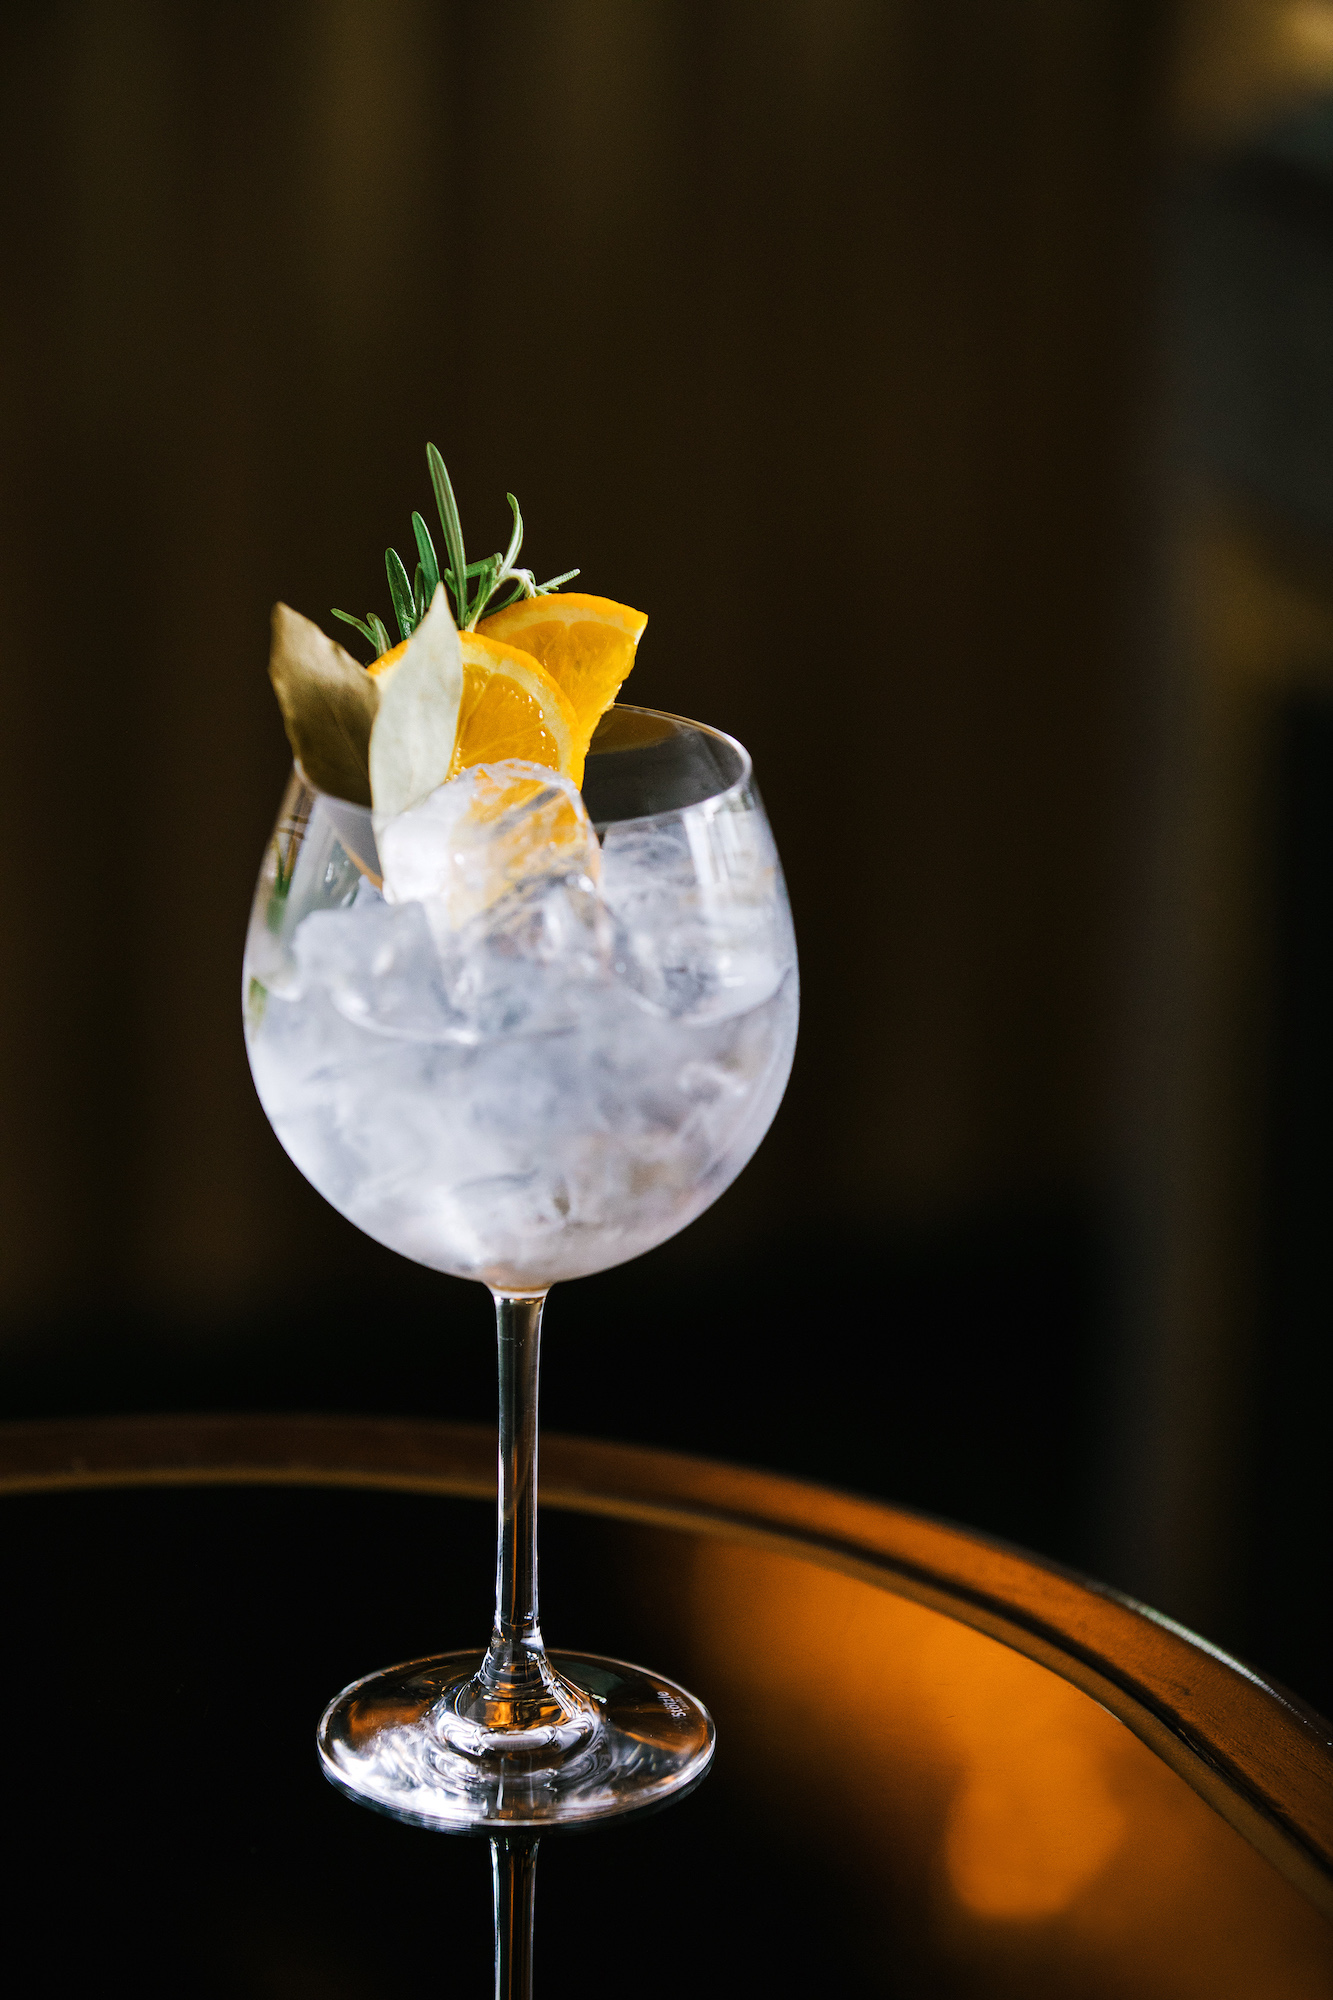 Art Deco Cocktails in Art Deco Spaces